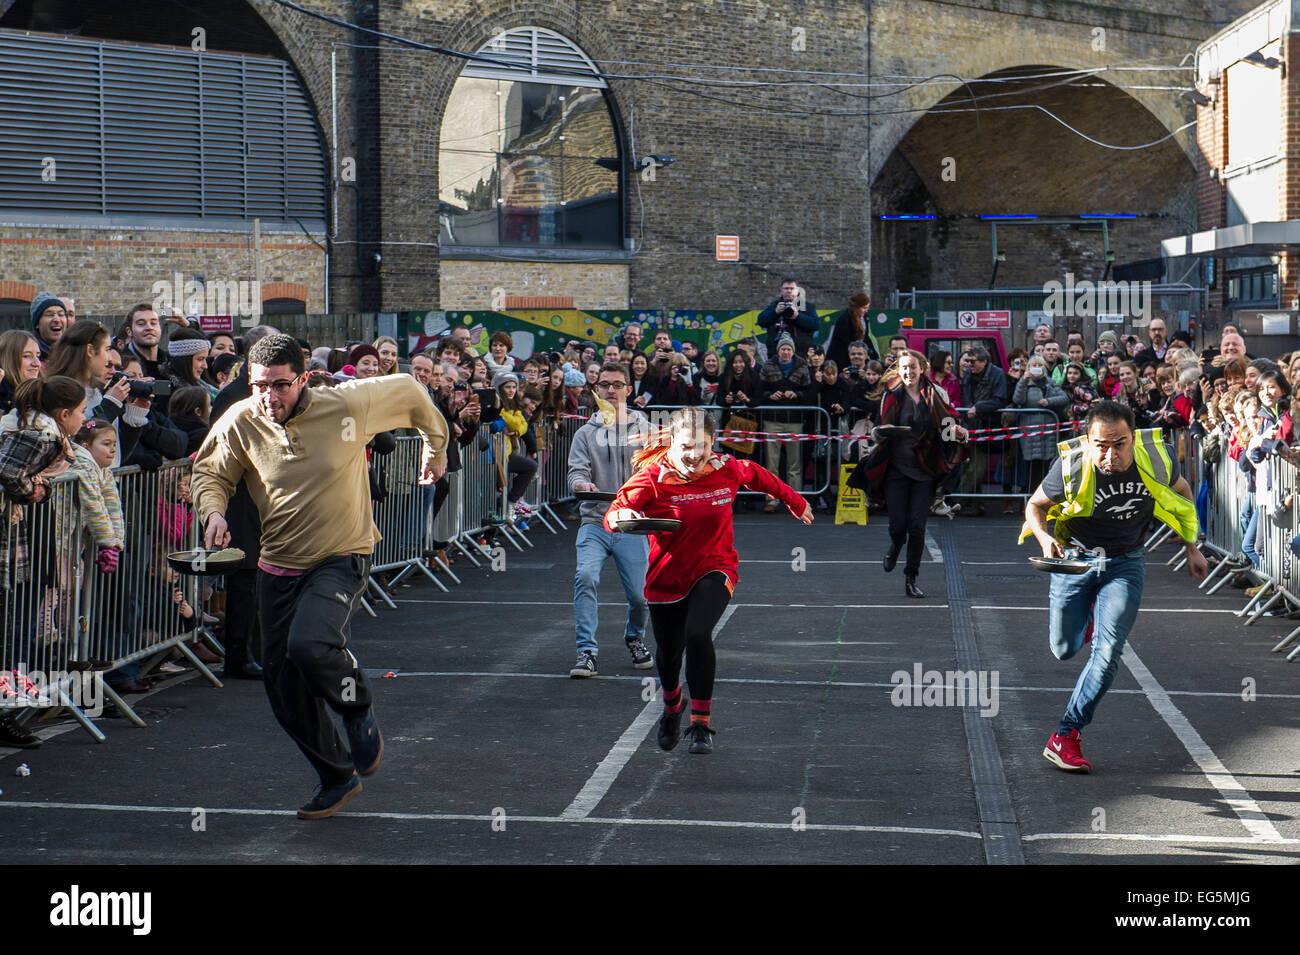 London, UK. 17th February, 2015.  The Better Bankside Annual Charity Pancake Race at Borough Market.  Credit:  Gordon - Stock Image